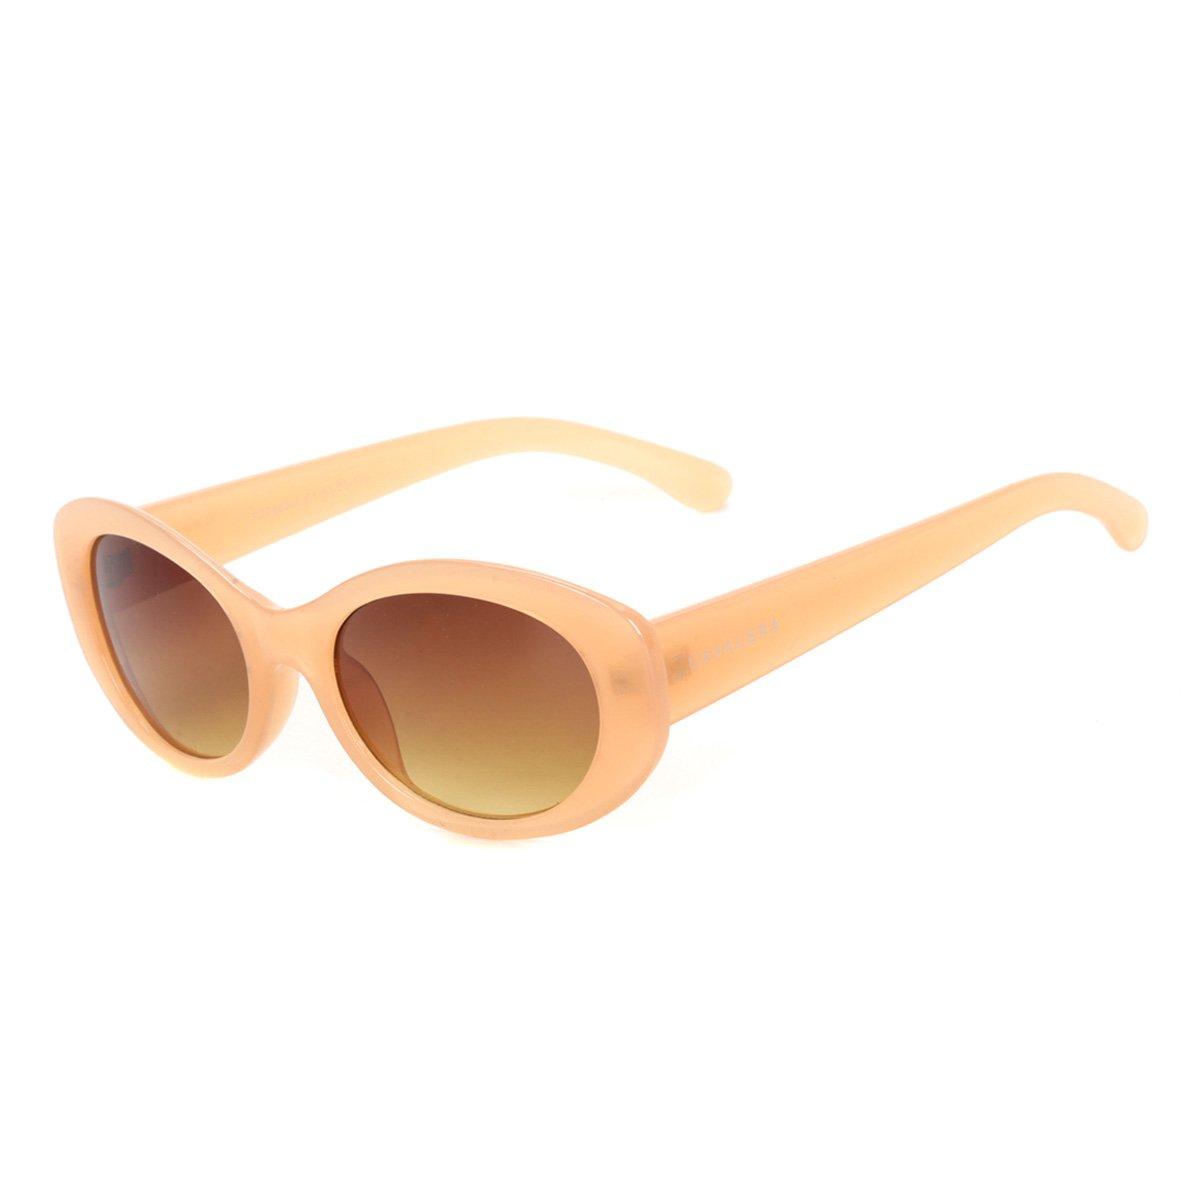 Óculos de Sol Cavalera MG0235 Feminino